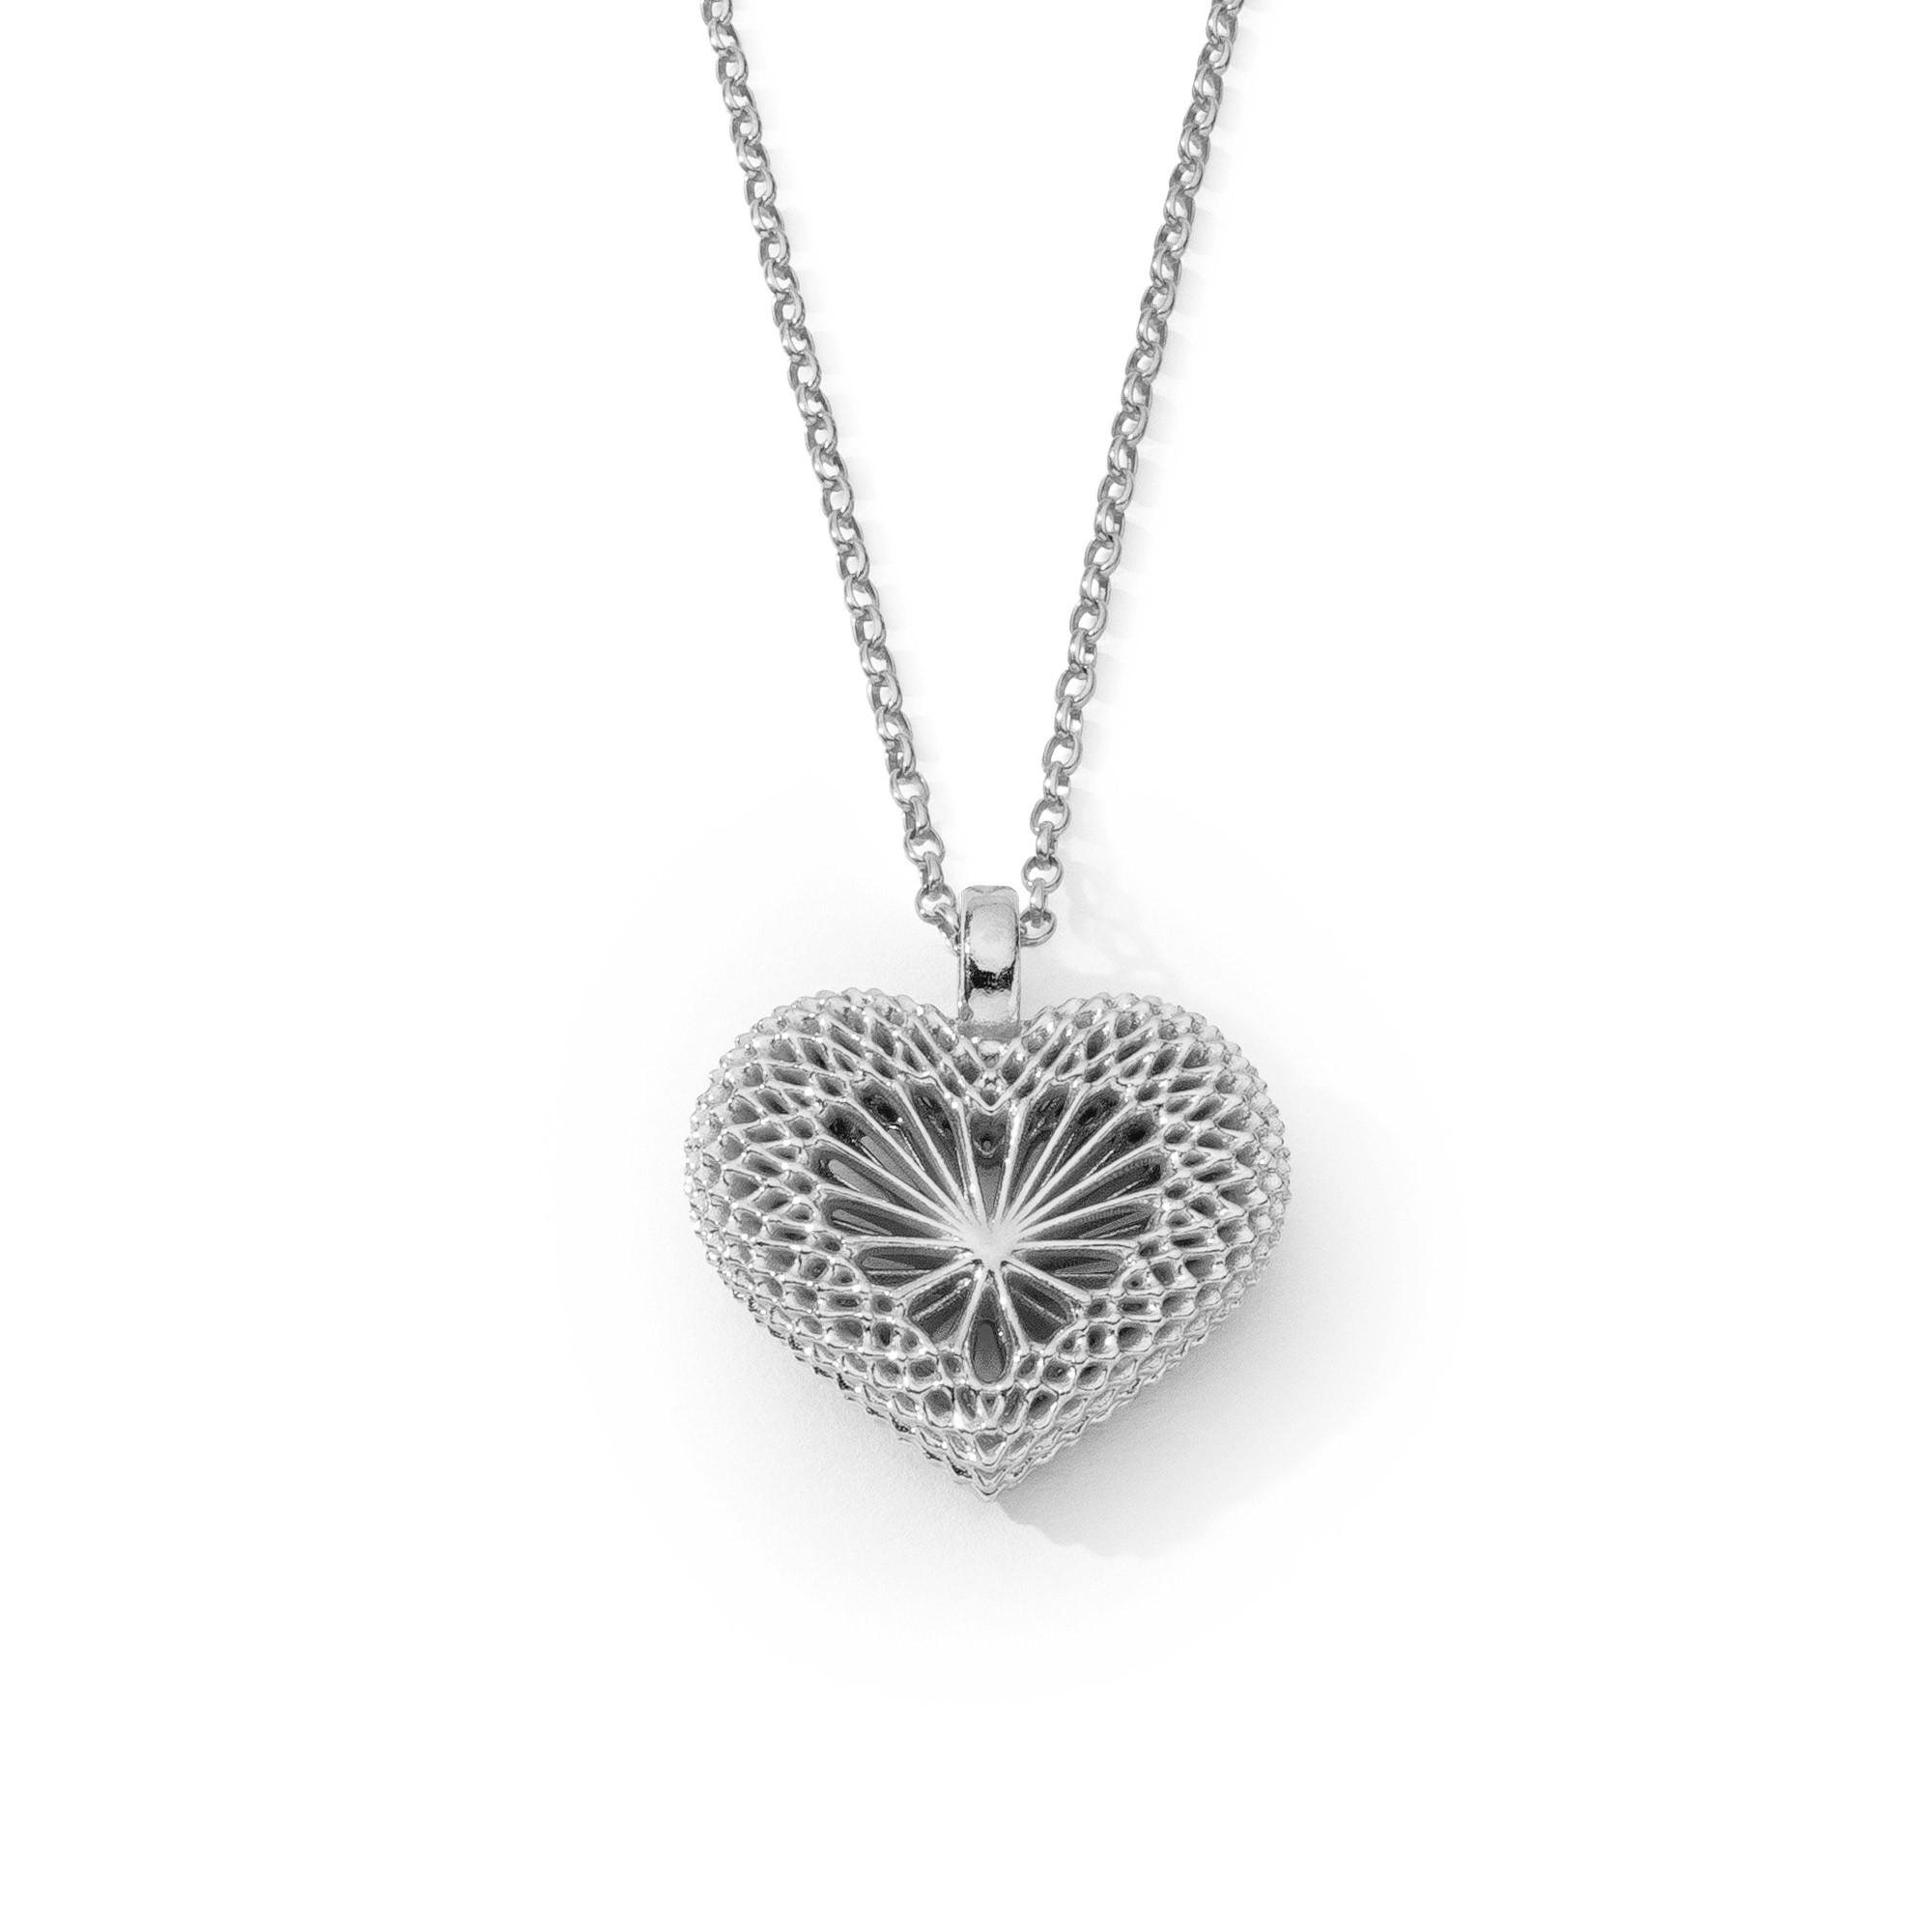 Naszyjnik serce ażurowe, srebro 925